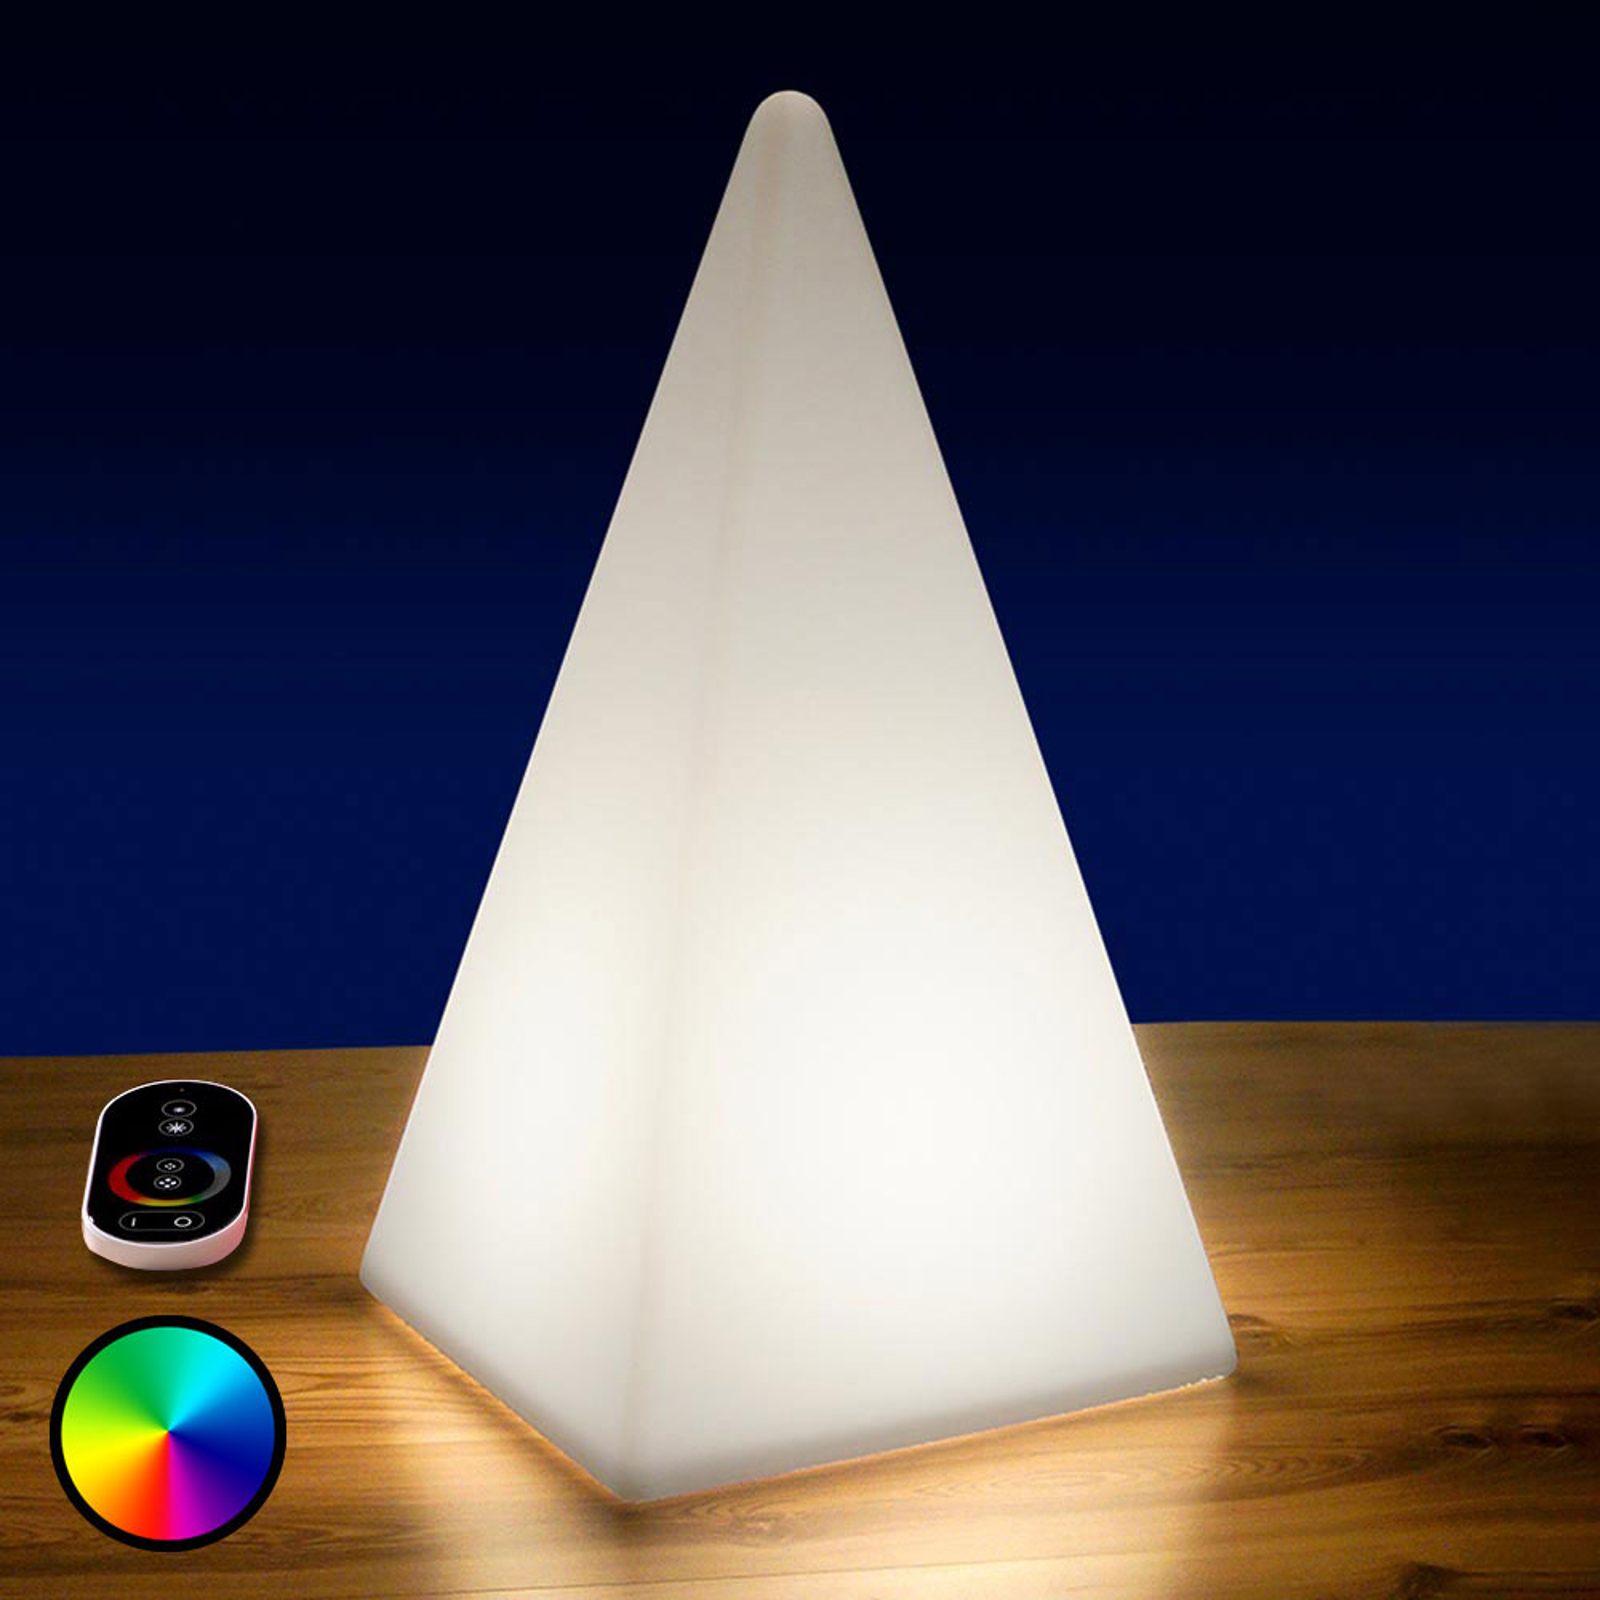 Akkubetriebene RGB-LED-Pyramide, 54 cm